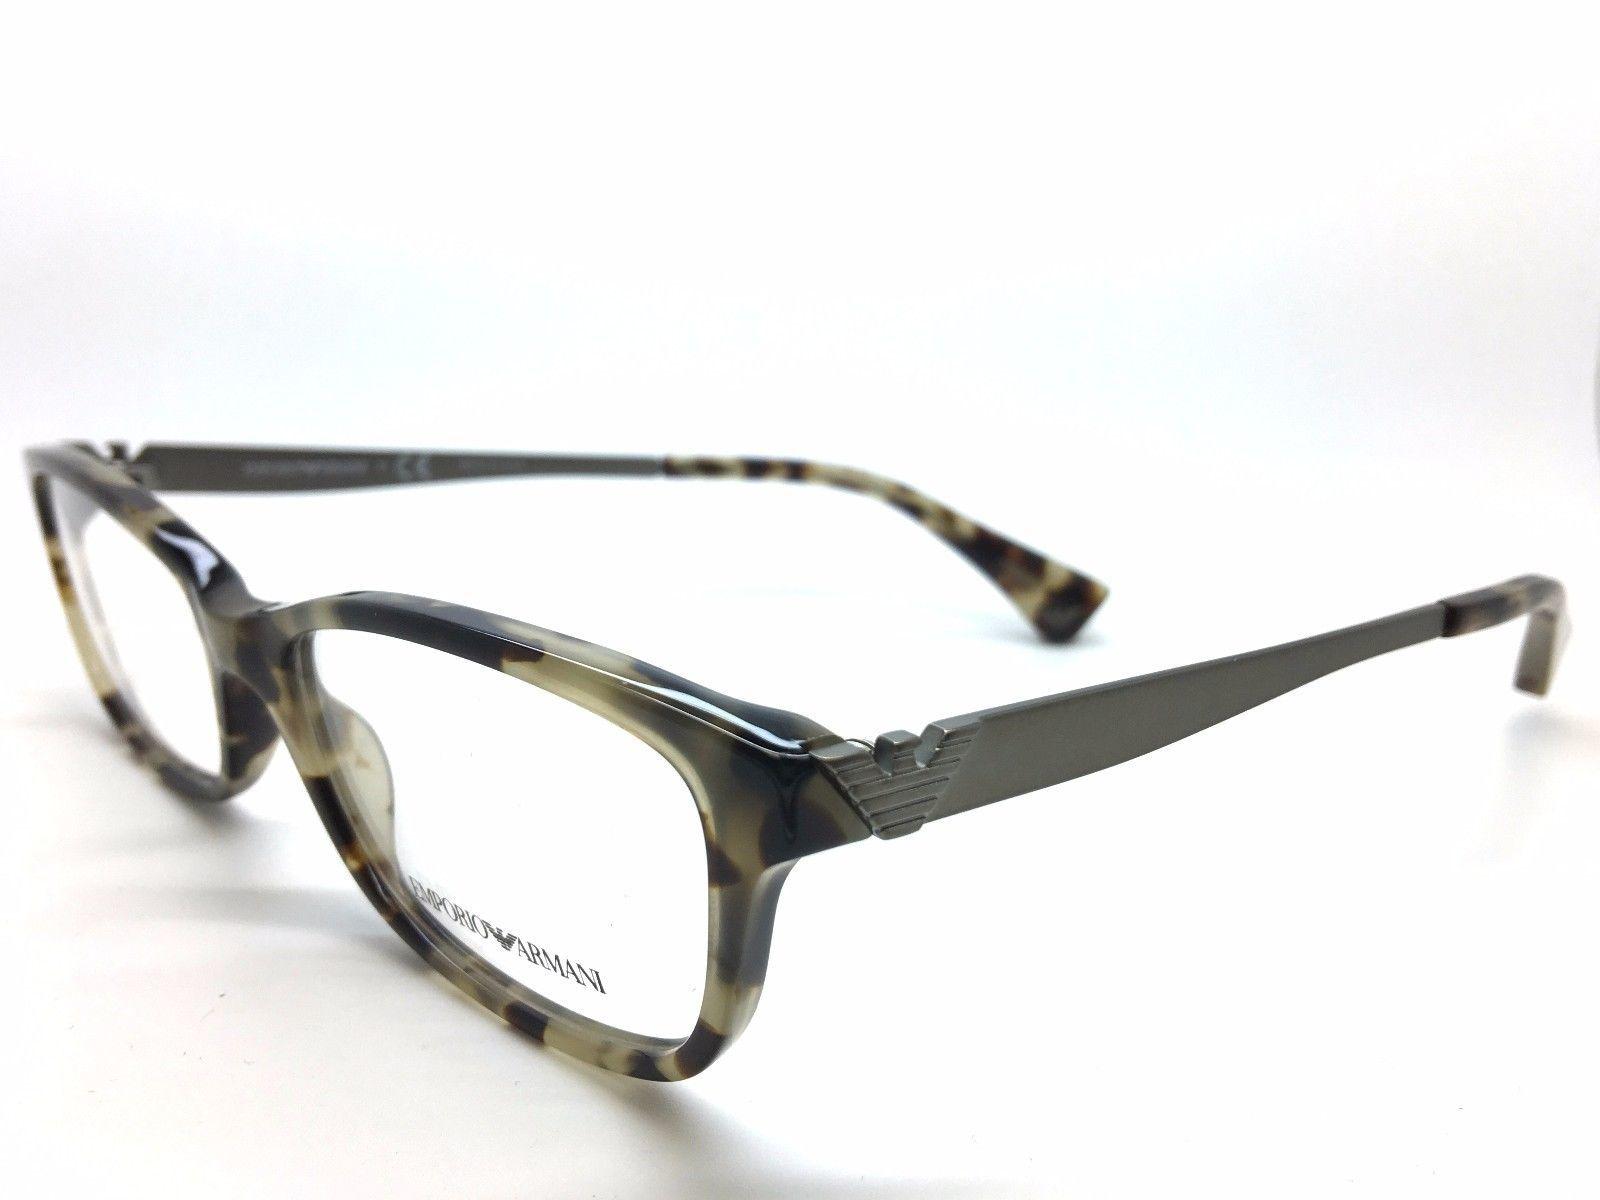 Emporio Armani Eyeglass Frame: 100 listings